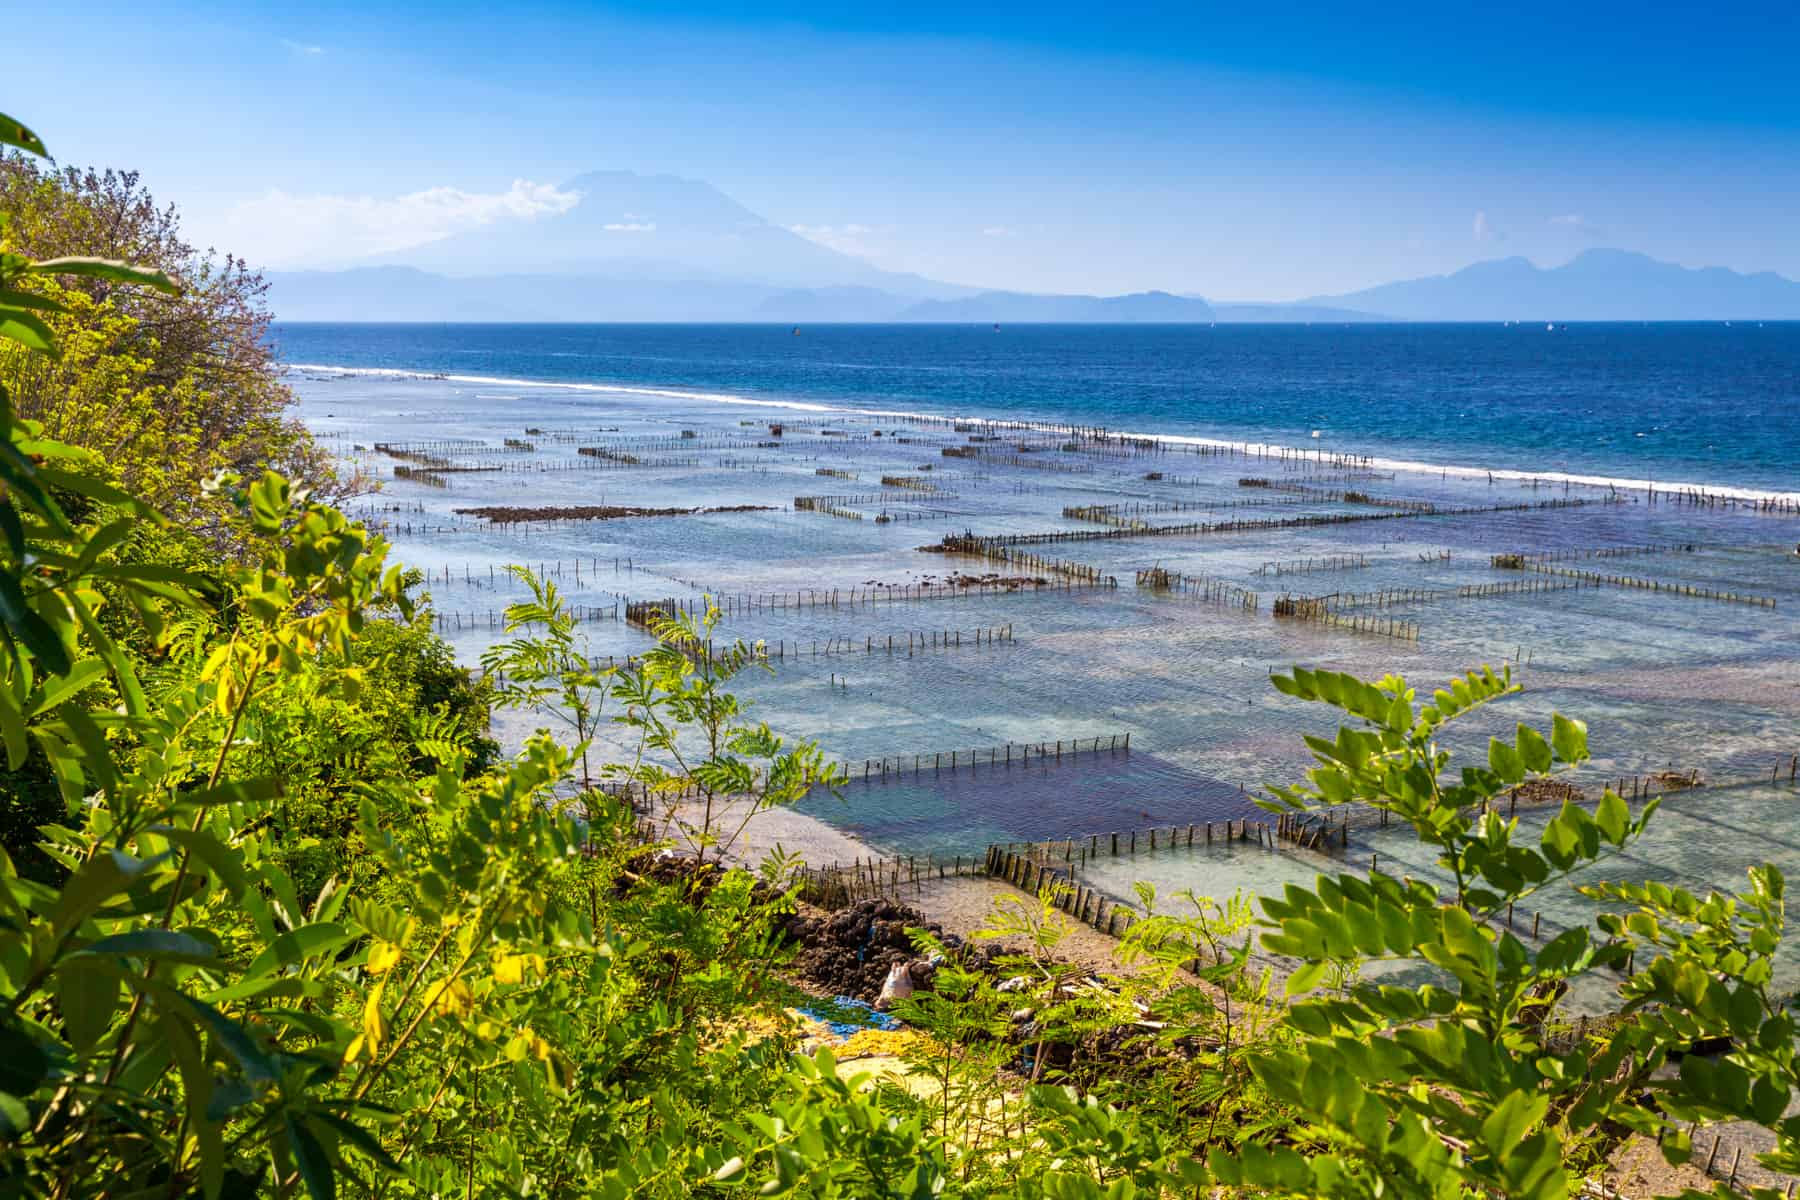 Economic impact of algae farms